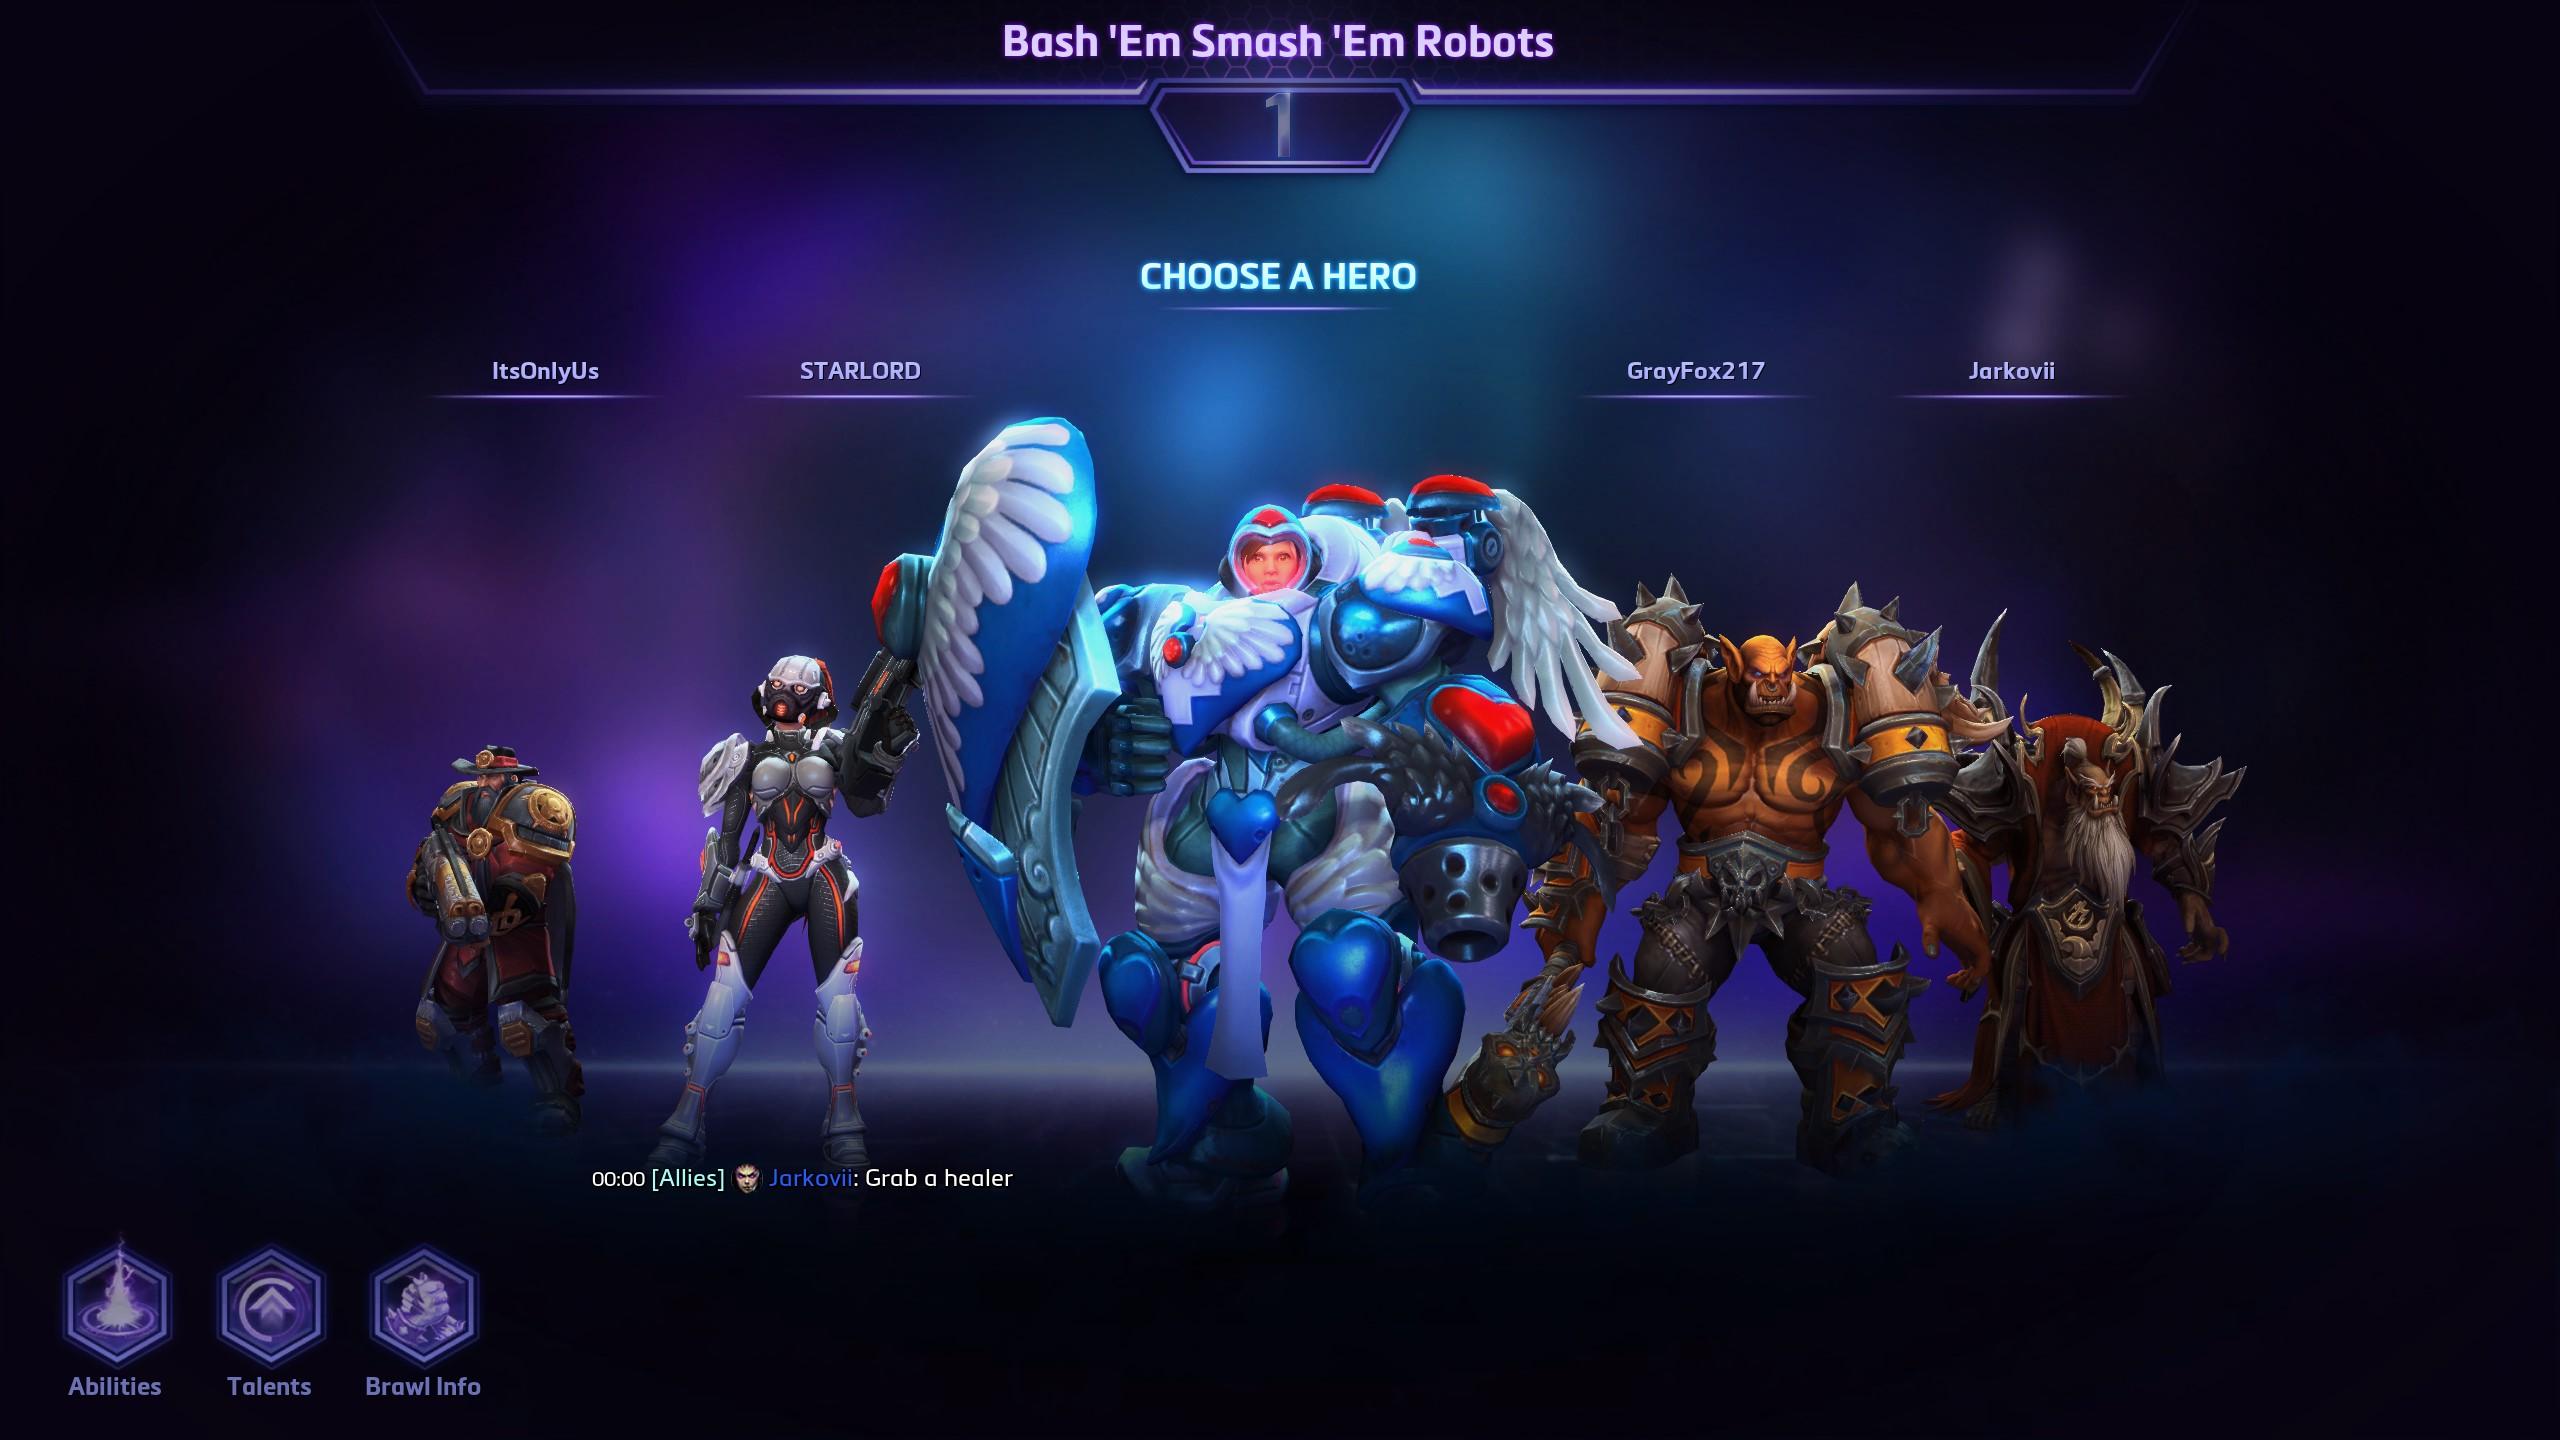 Brawl Team Display